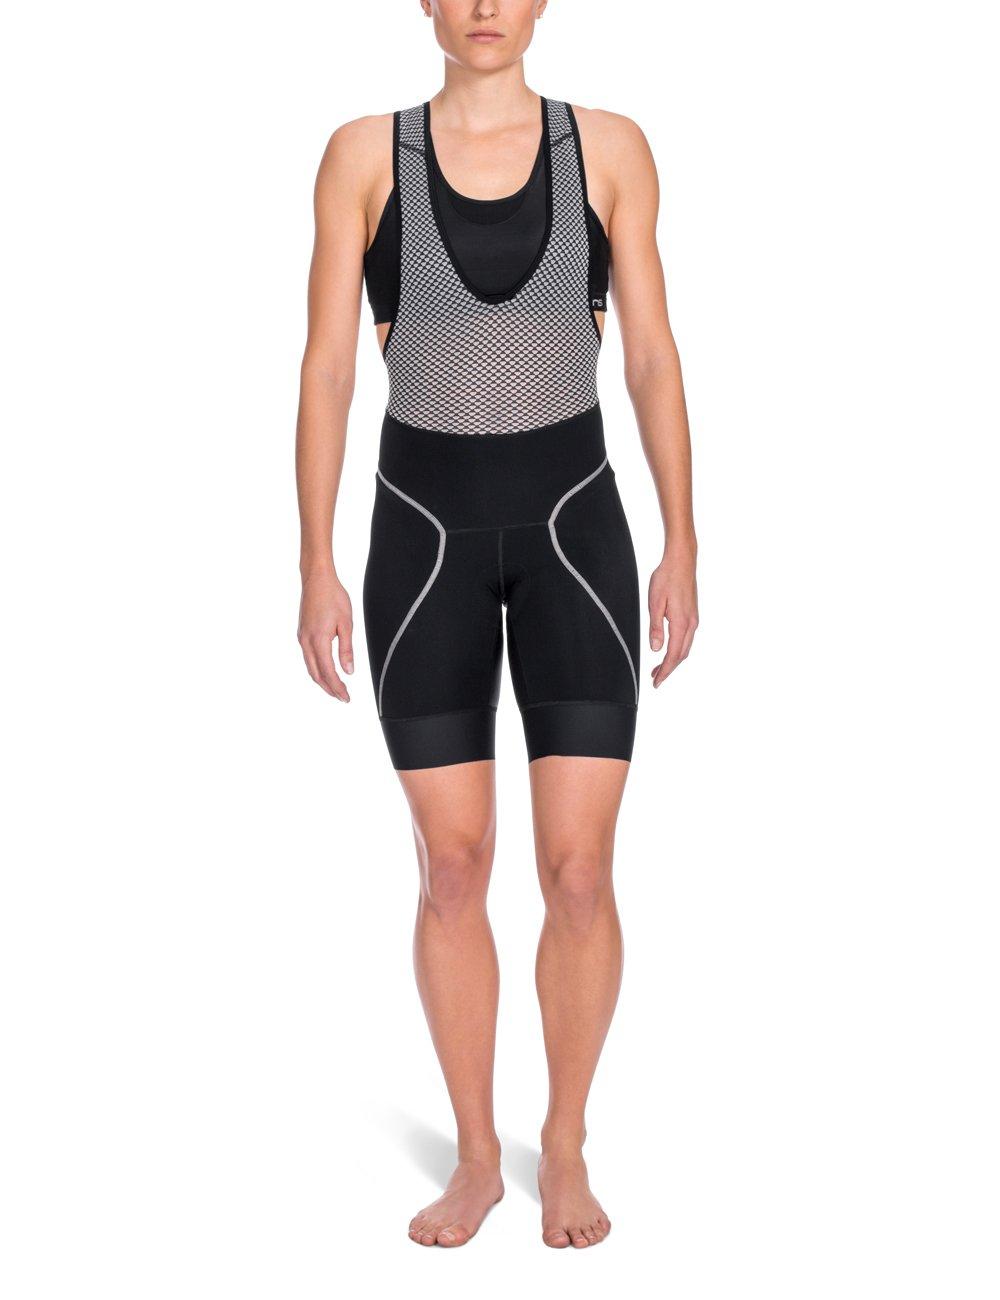 SKINS Women's Cycle Bib Shorts, Black, Medium